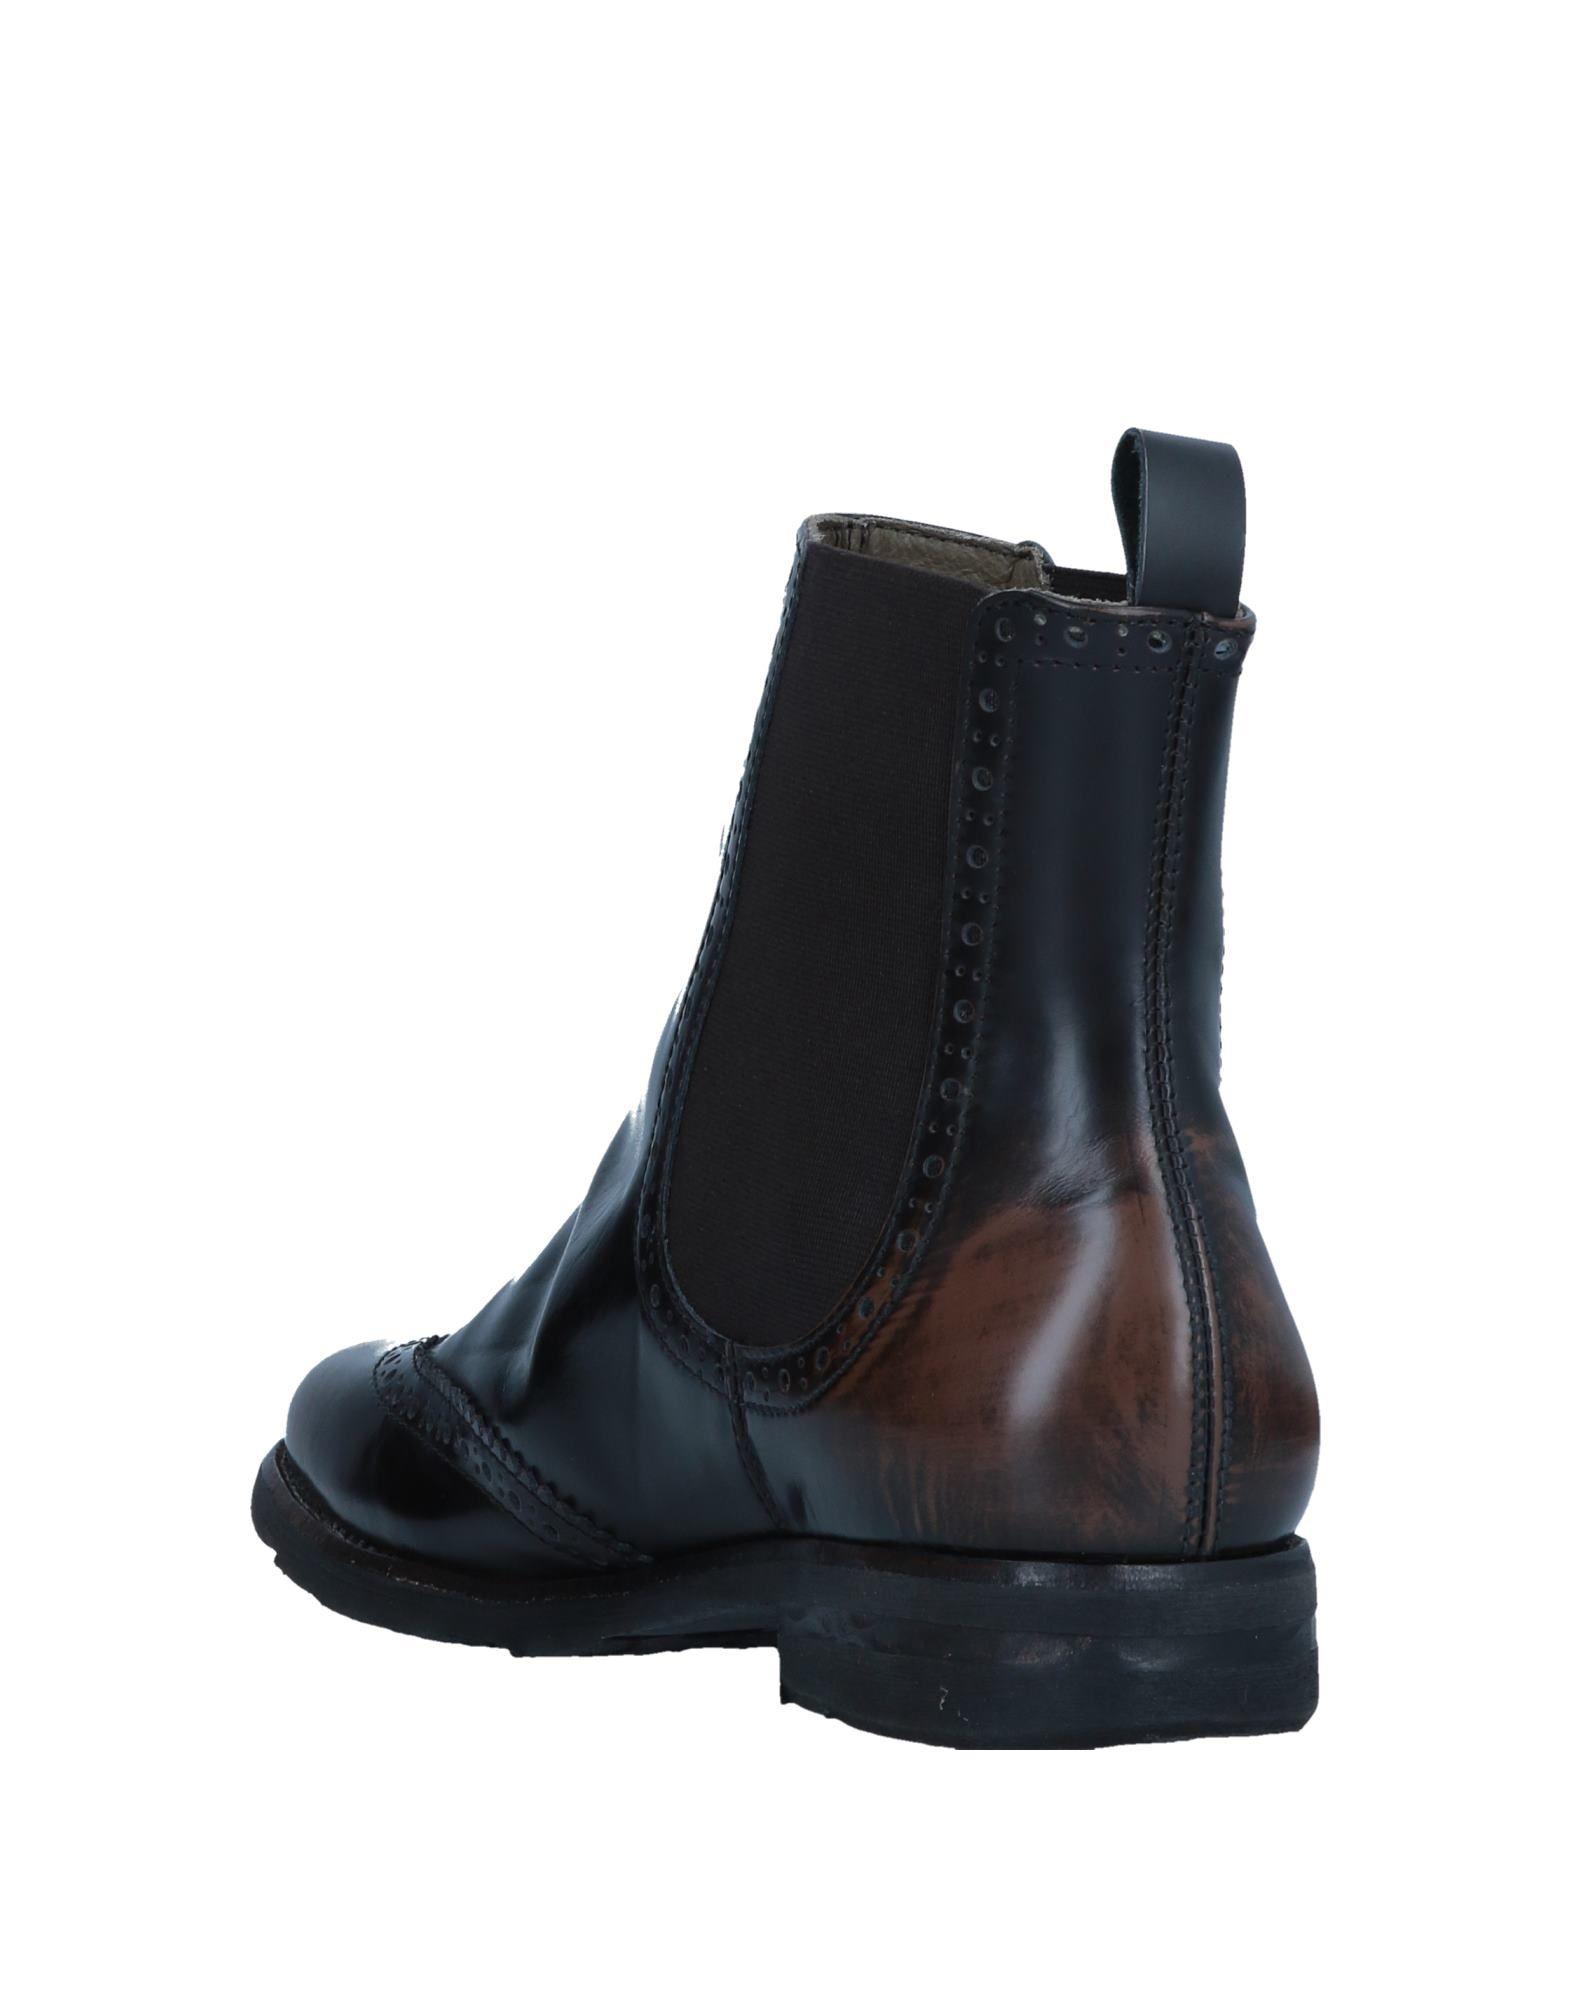 Gut um billige Damen Schuhe zu tragenCatarina Martins Chelsea Boots Damen billige  11552895FJ 7c0734